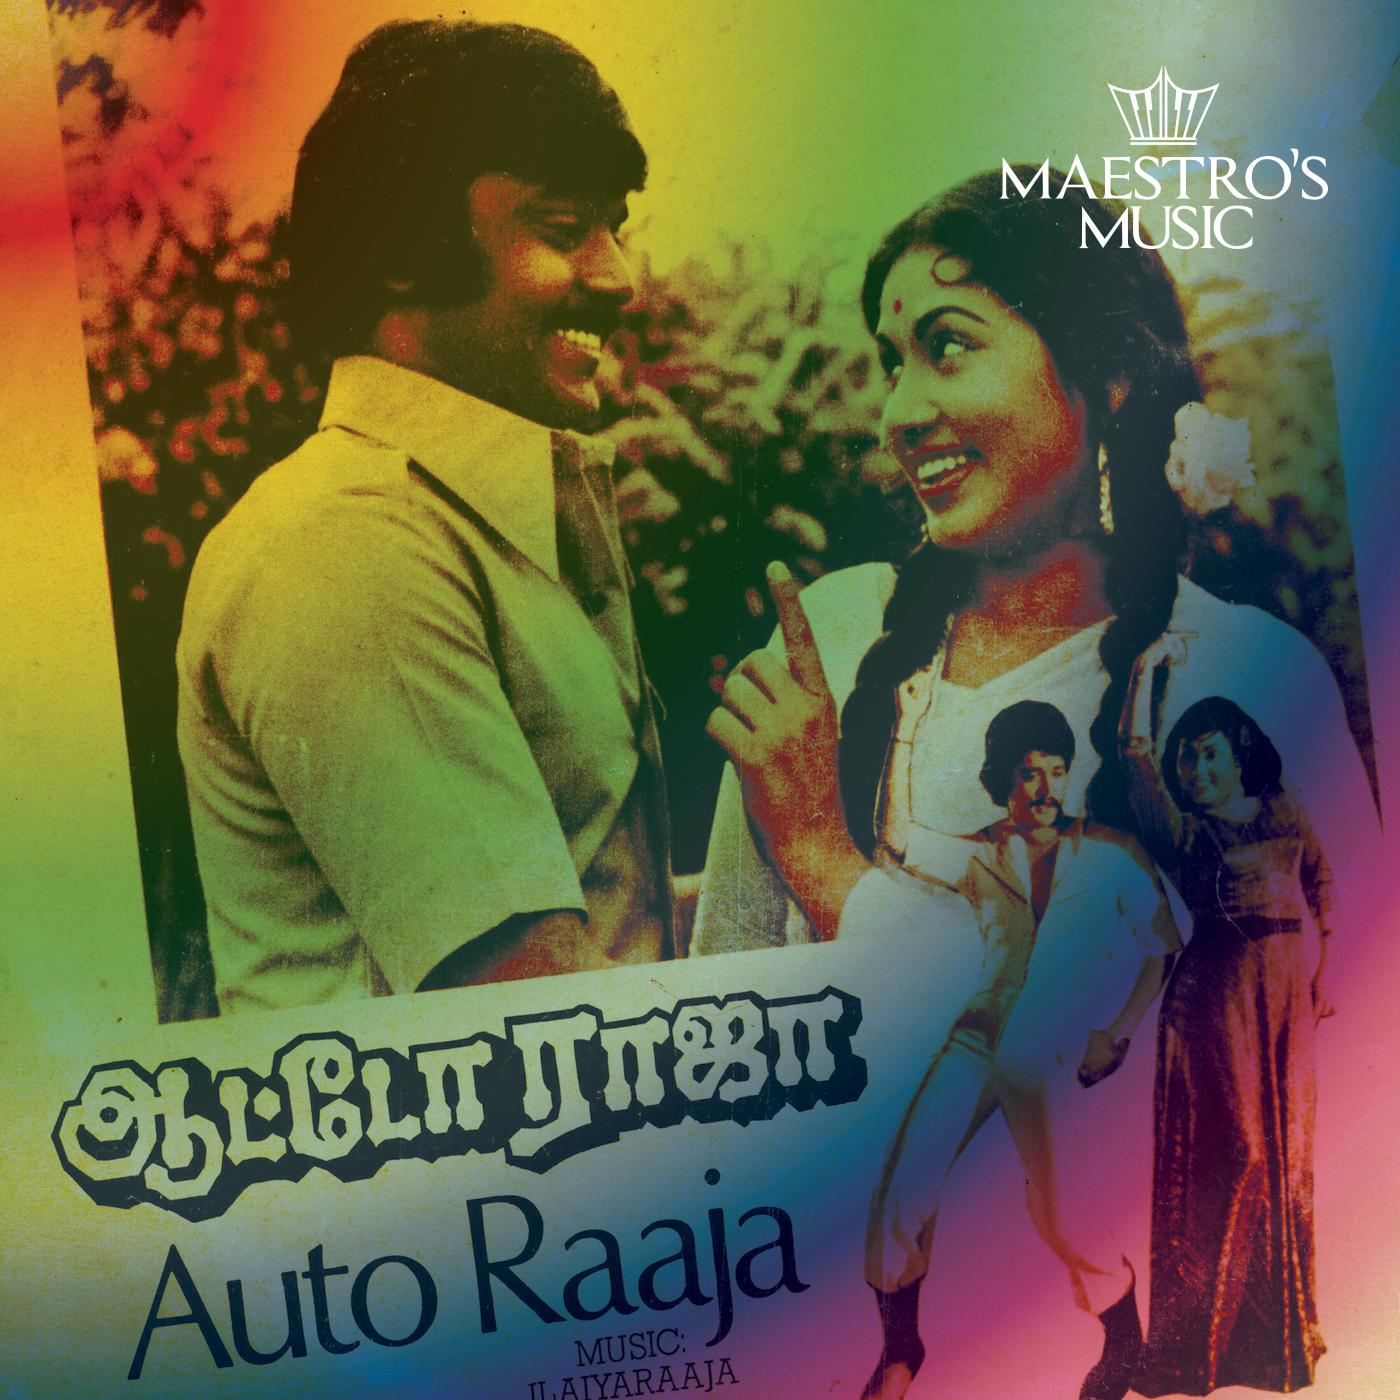 Auto Raja ((1982))